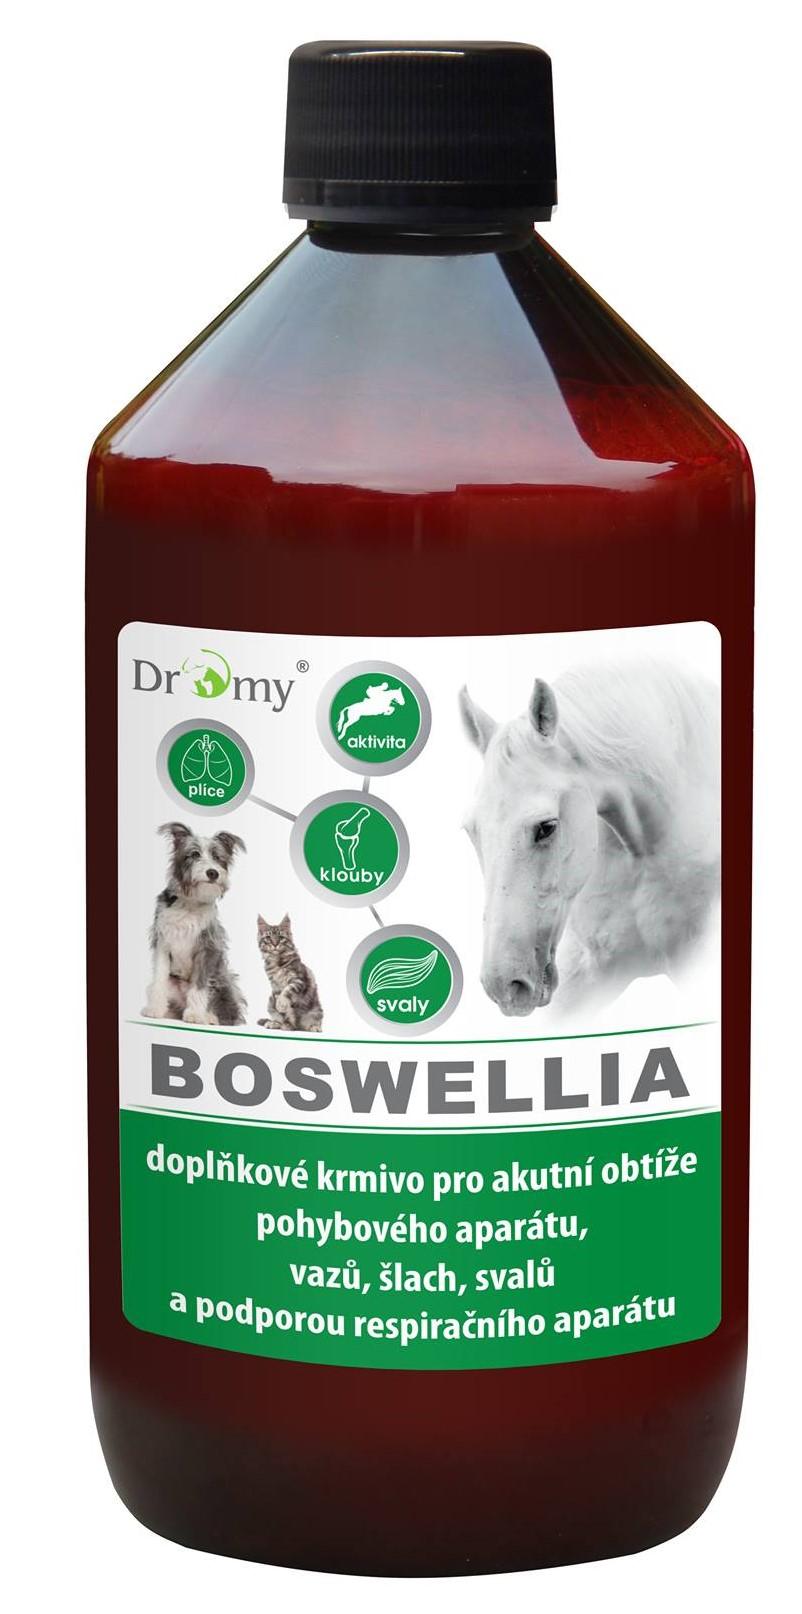 Dromy BOSWELLIA Serrata liquid 1l